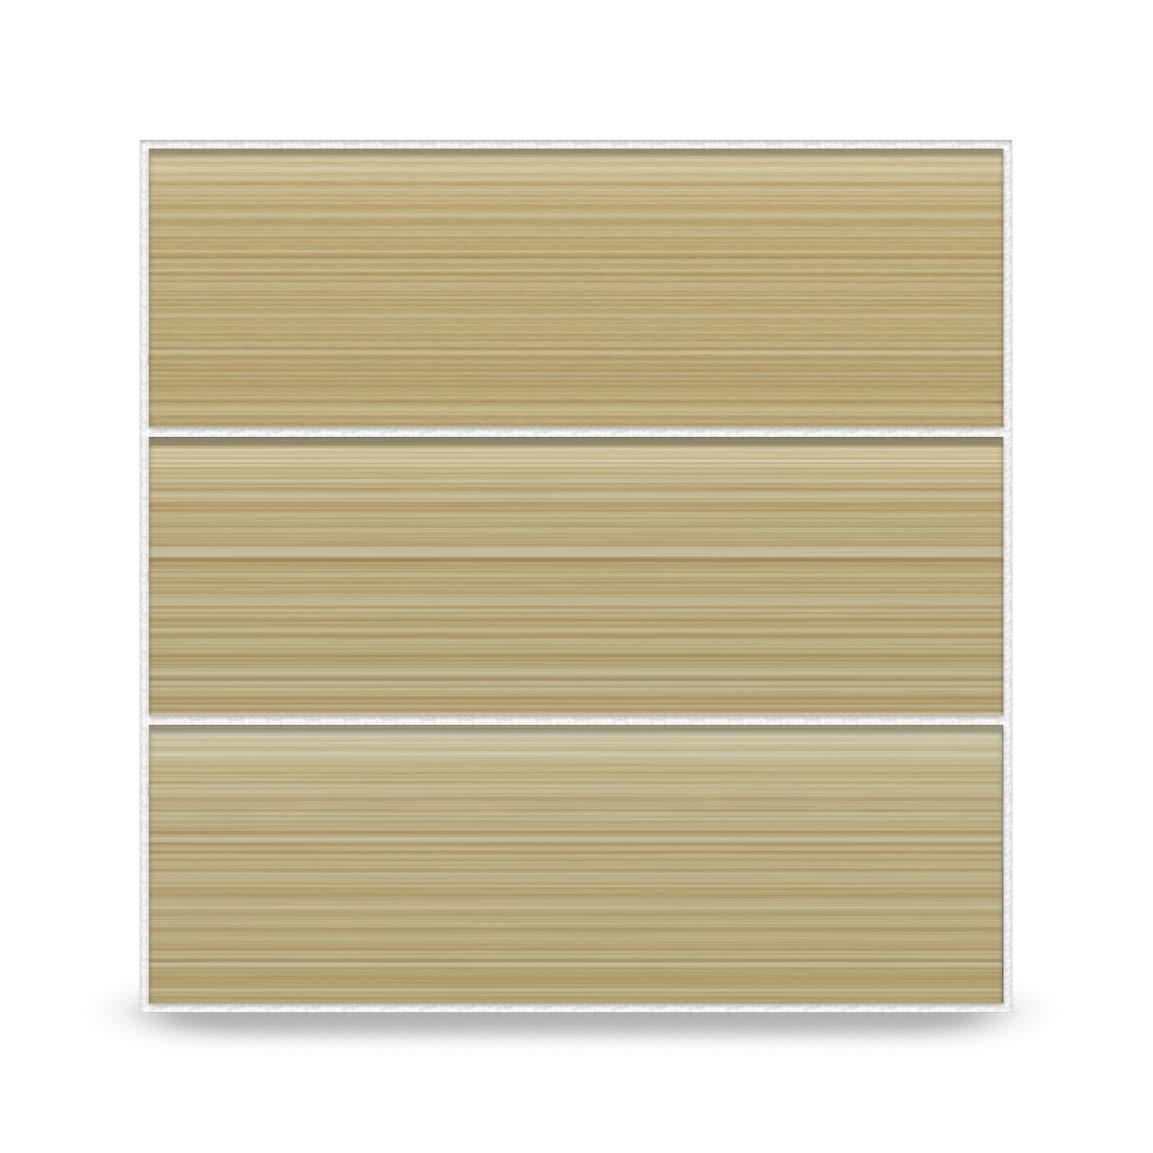 Bodesi Cupatea Light Brown Glass Subway Tile for Kitchen Backsplash or Bathroom, 4x12